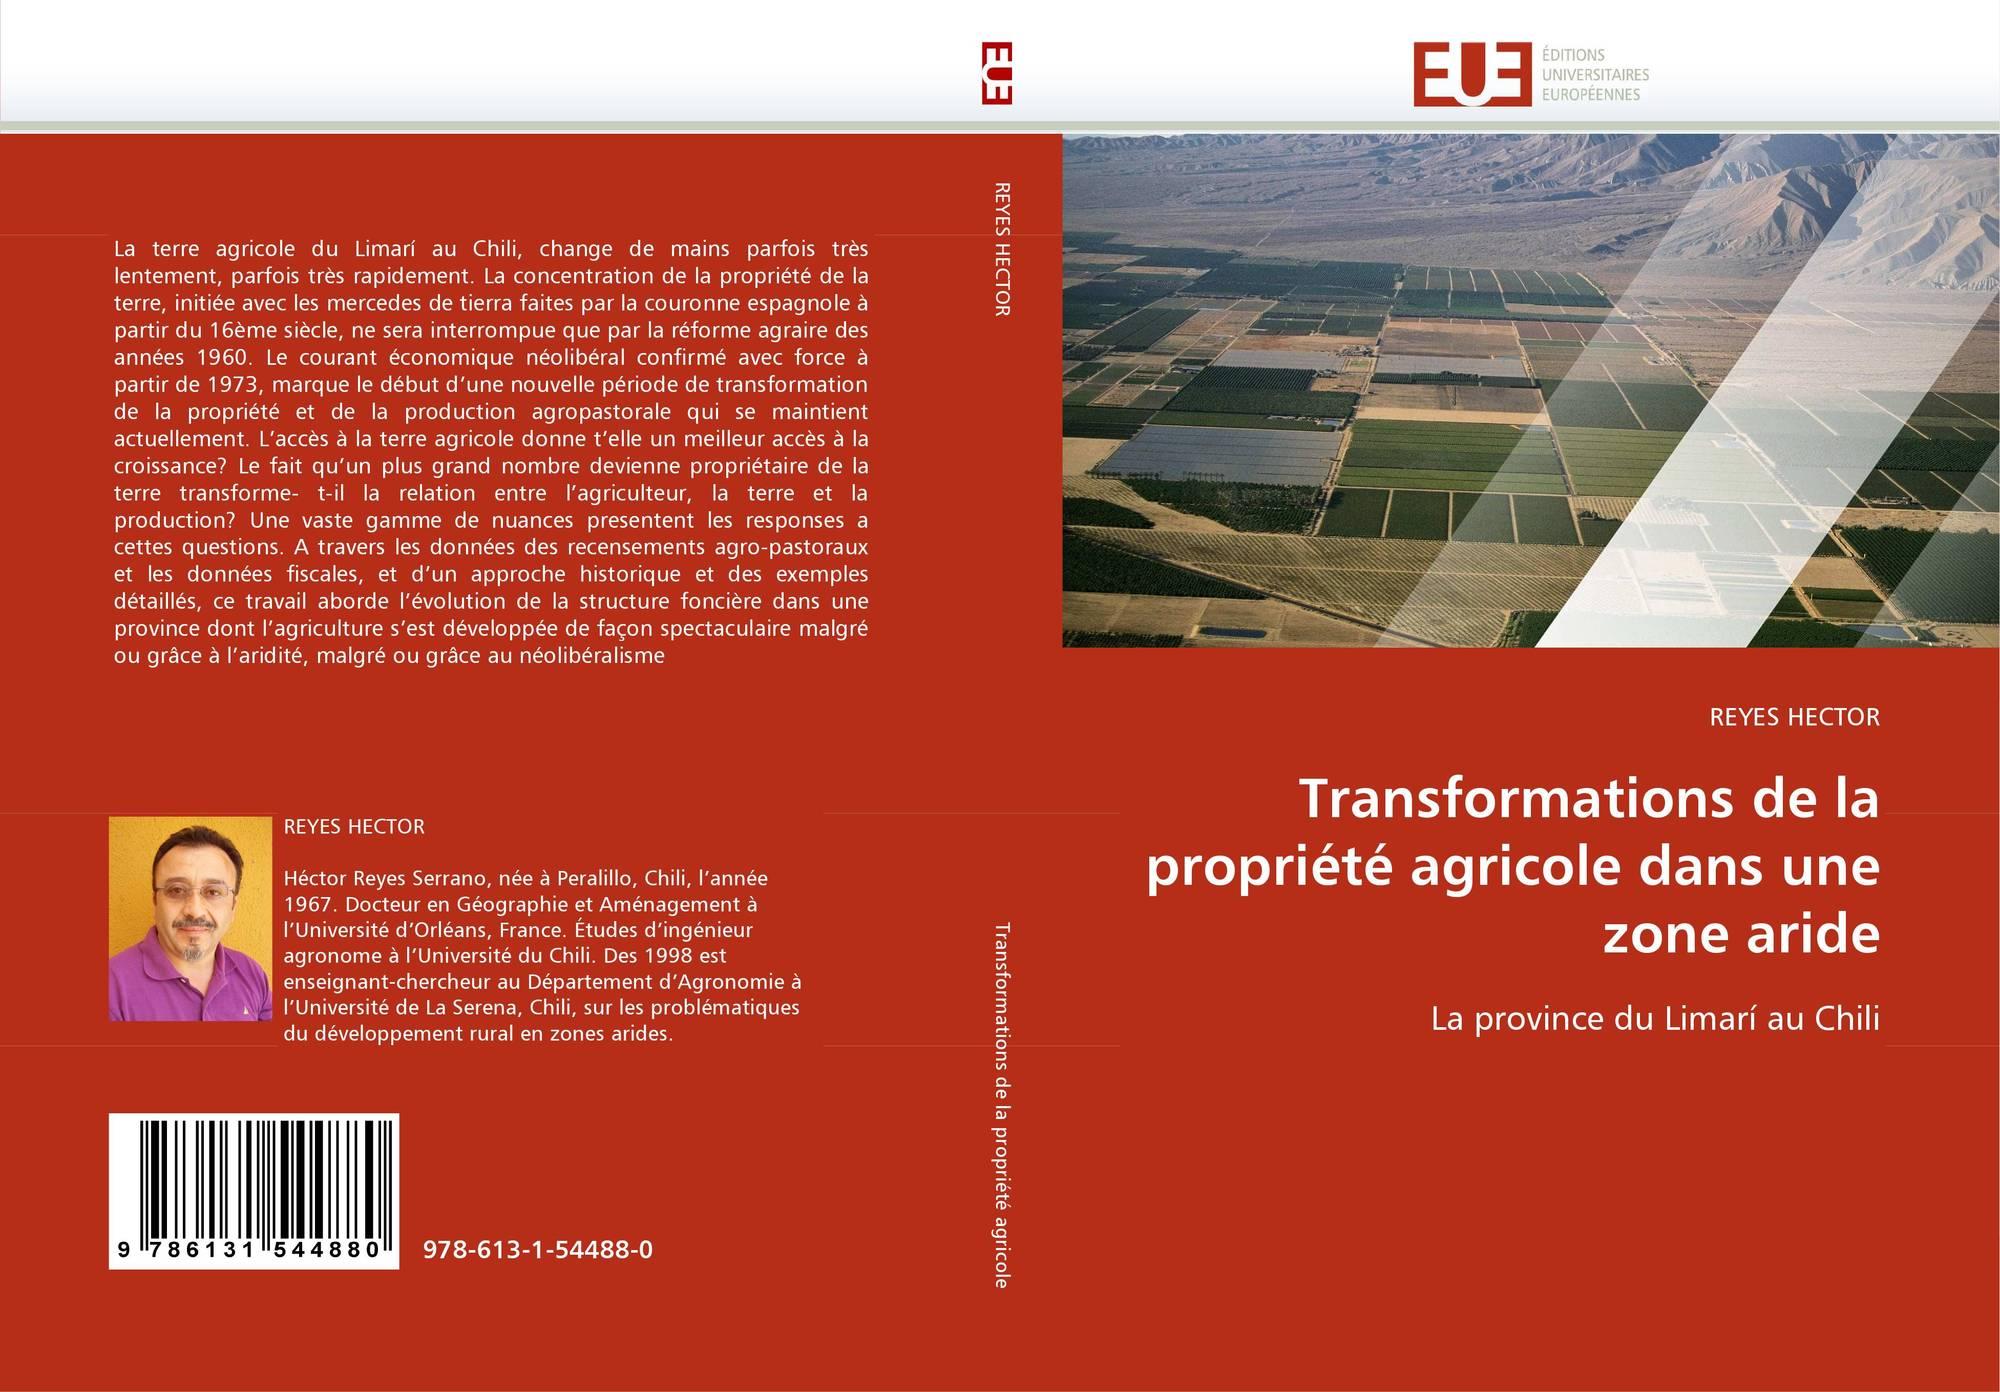 Agriculture zone aride